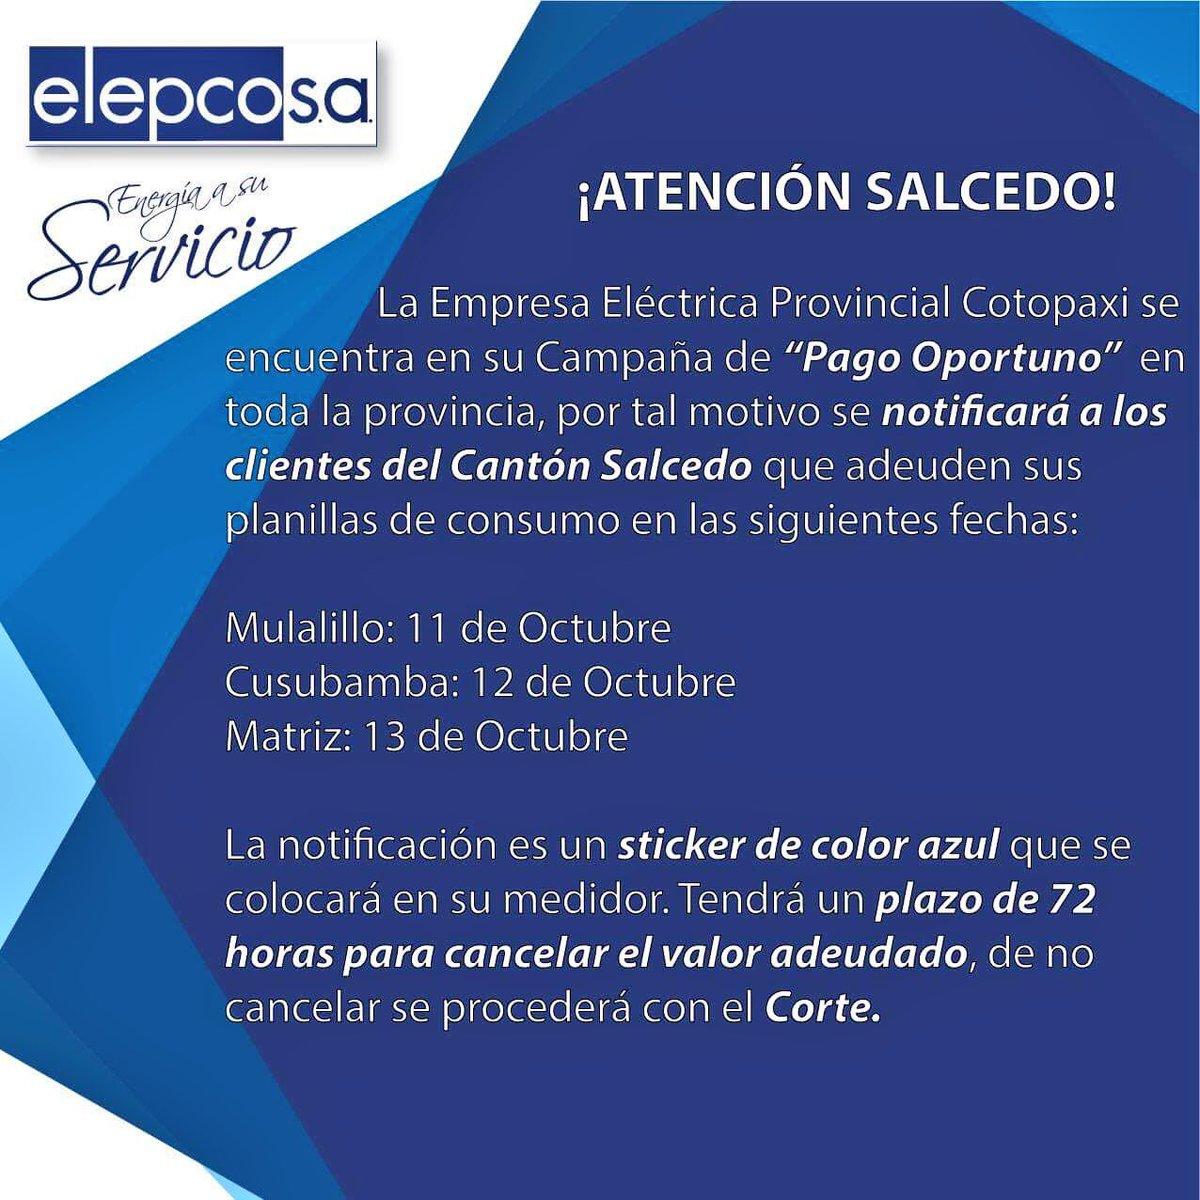 RT @elepcosa: ⛔️ATENCIÓN SALCEDO❗️ La Campaña de Pago Oportuno inicia en tu cantón. Más Info 👇🏻👇🏻 https://t.co/4cOTCokAEg